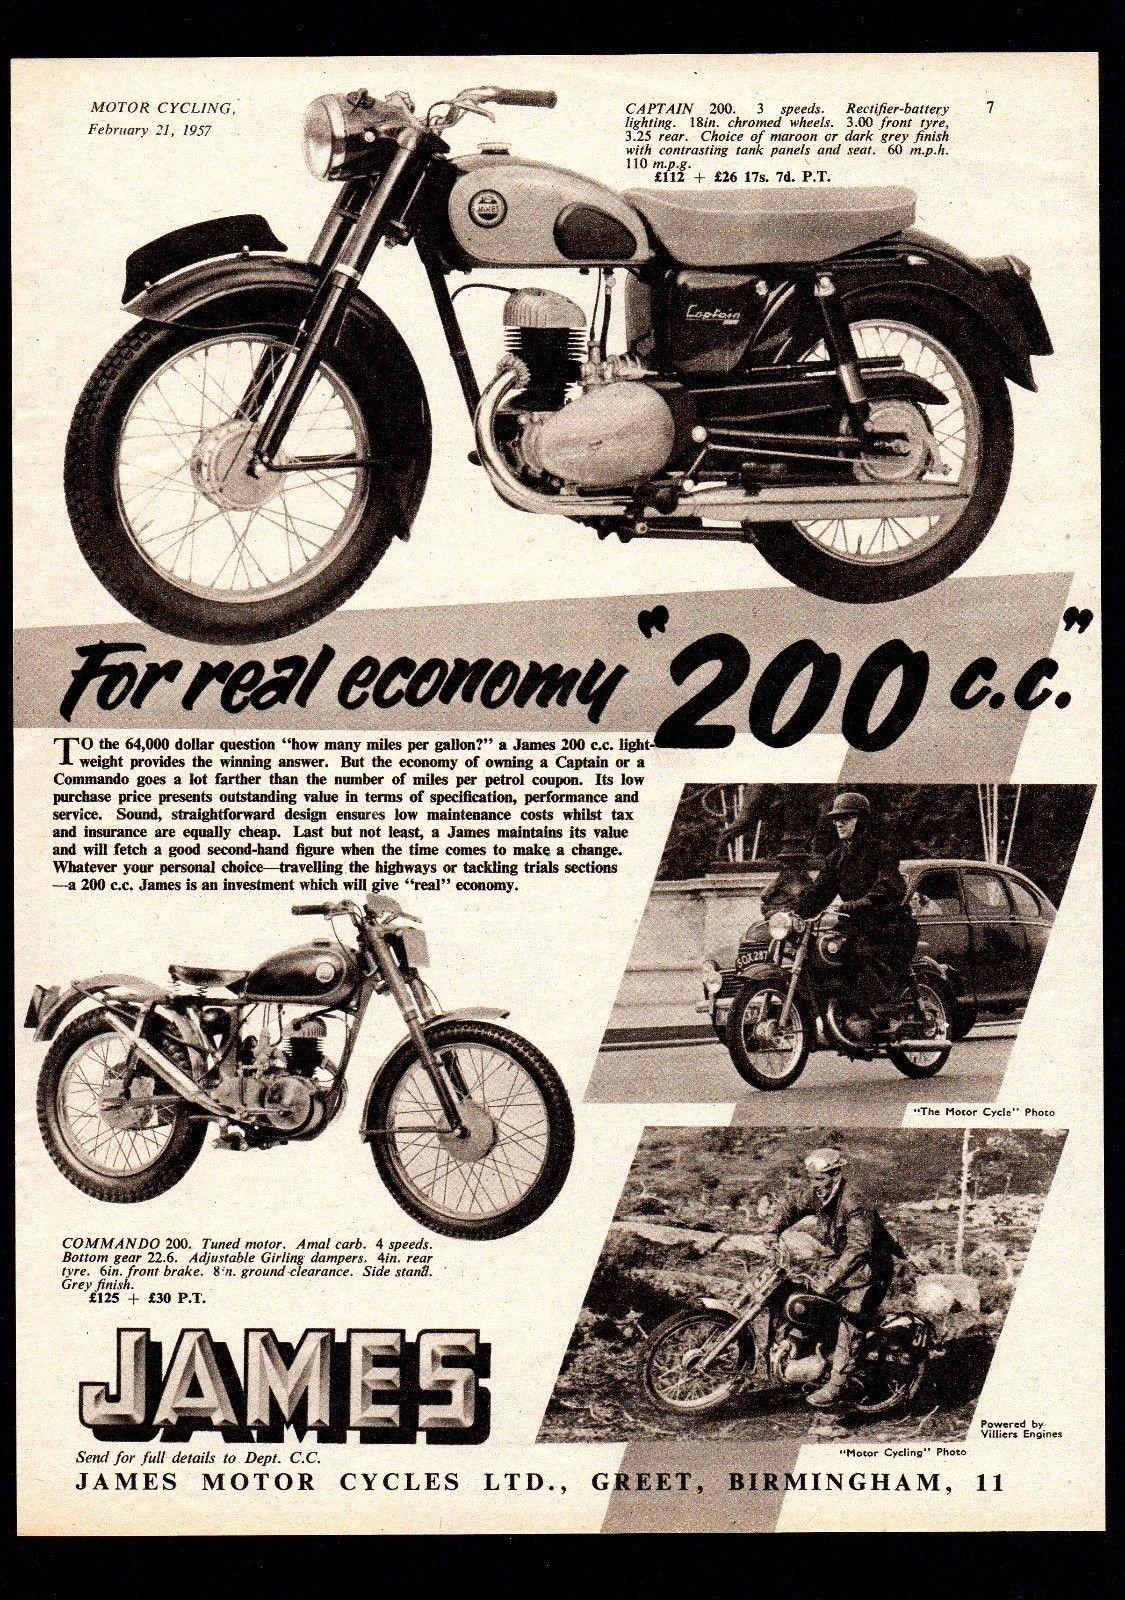 FEBRUARY 1957 JAMES CAPTAIN 200 MOTORCYCLE COMMANDO TRIALS MAGAZINE ADVERT.